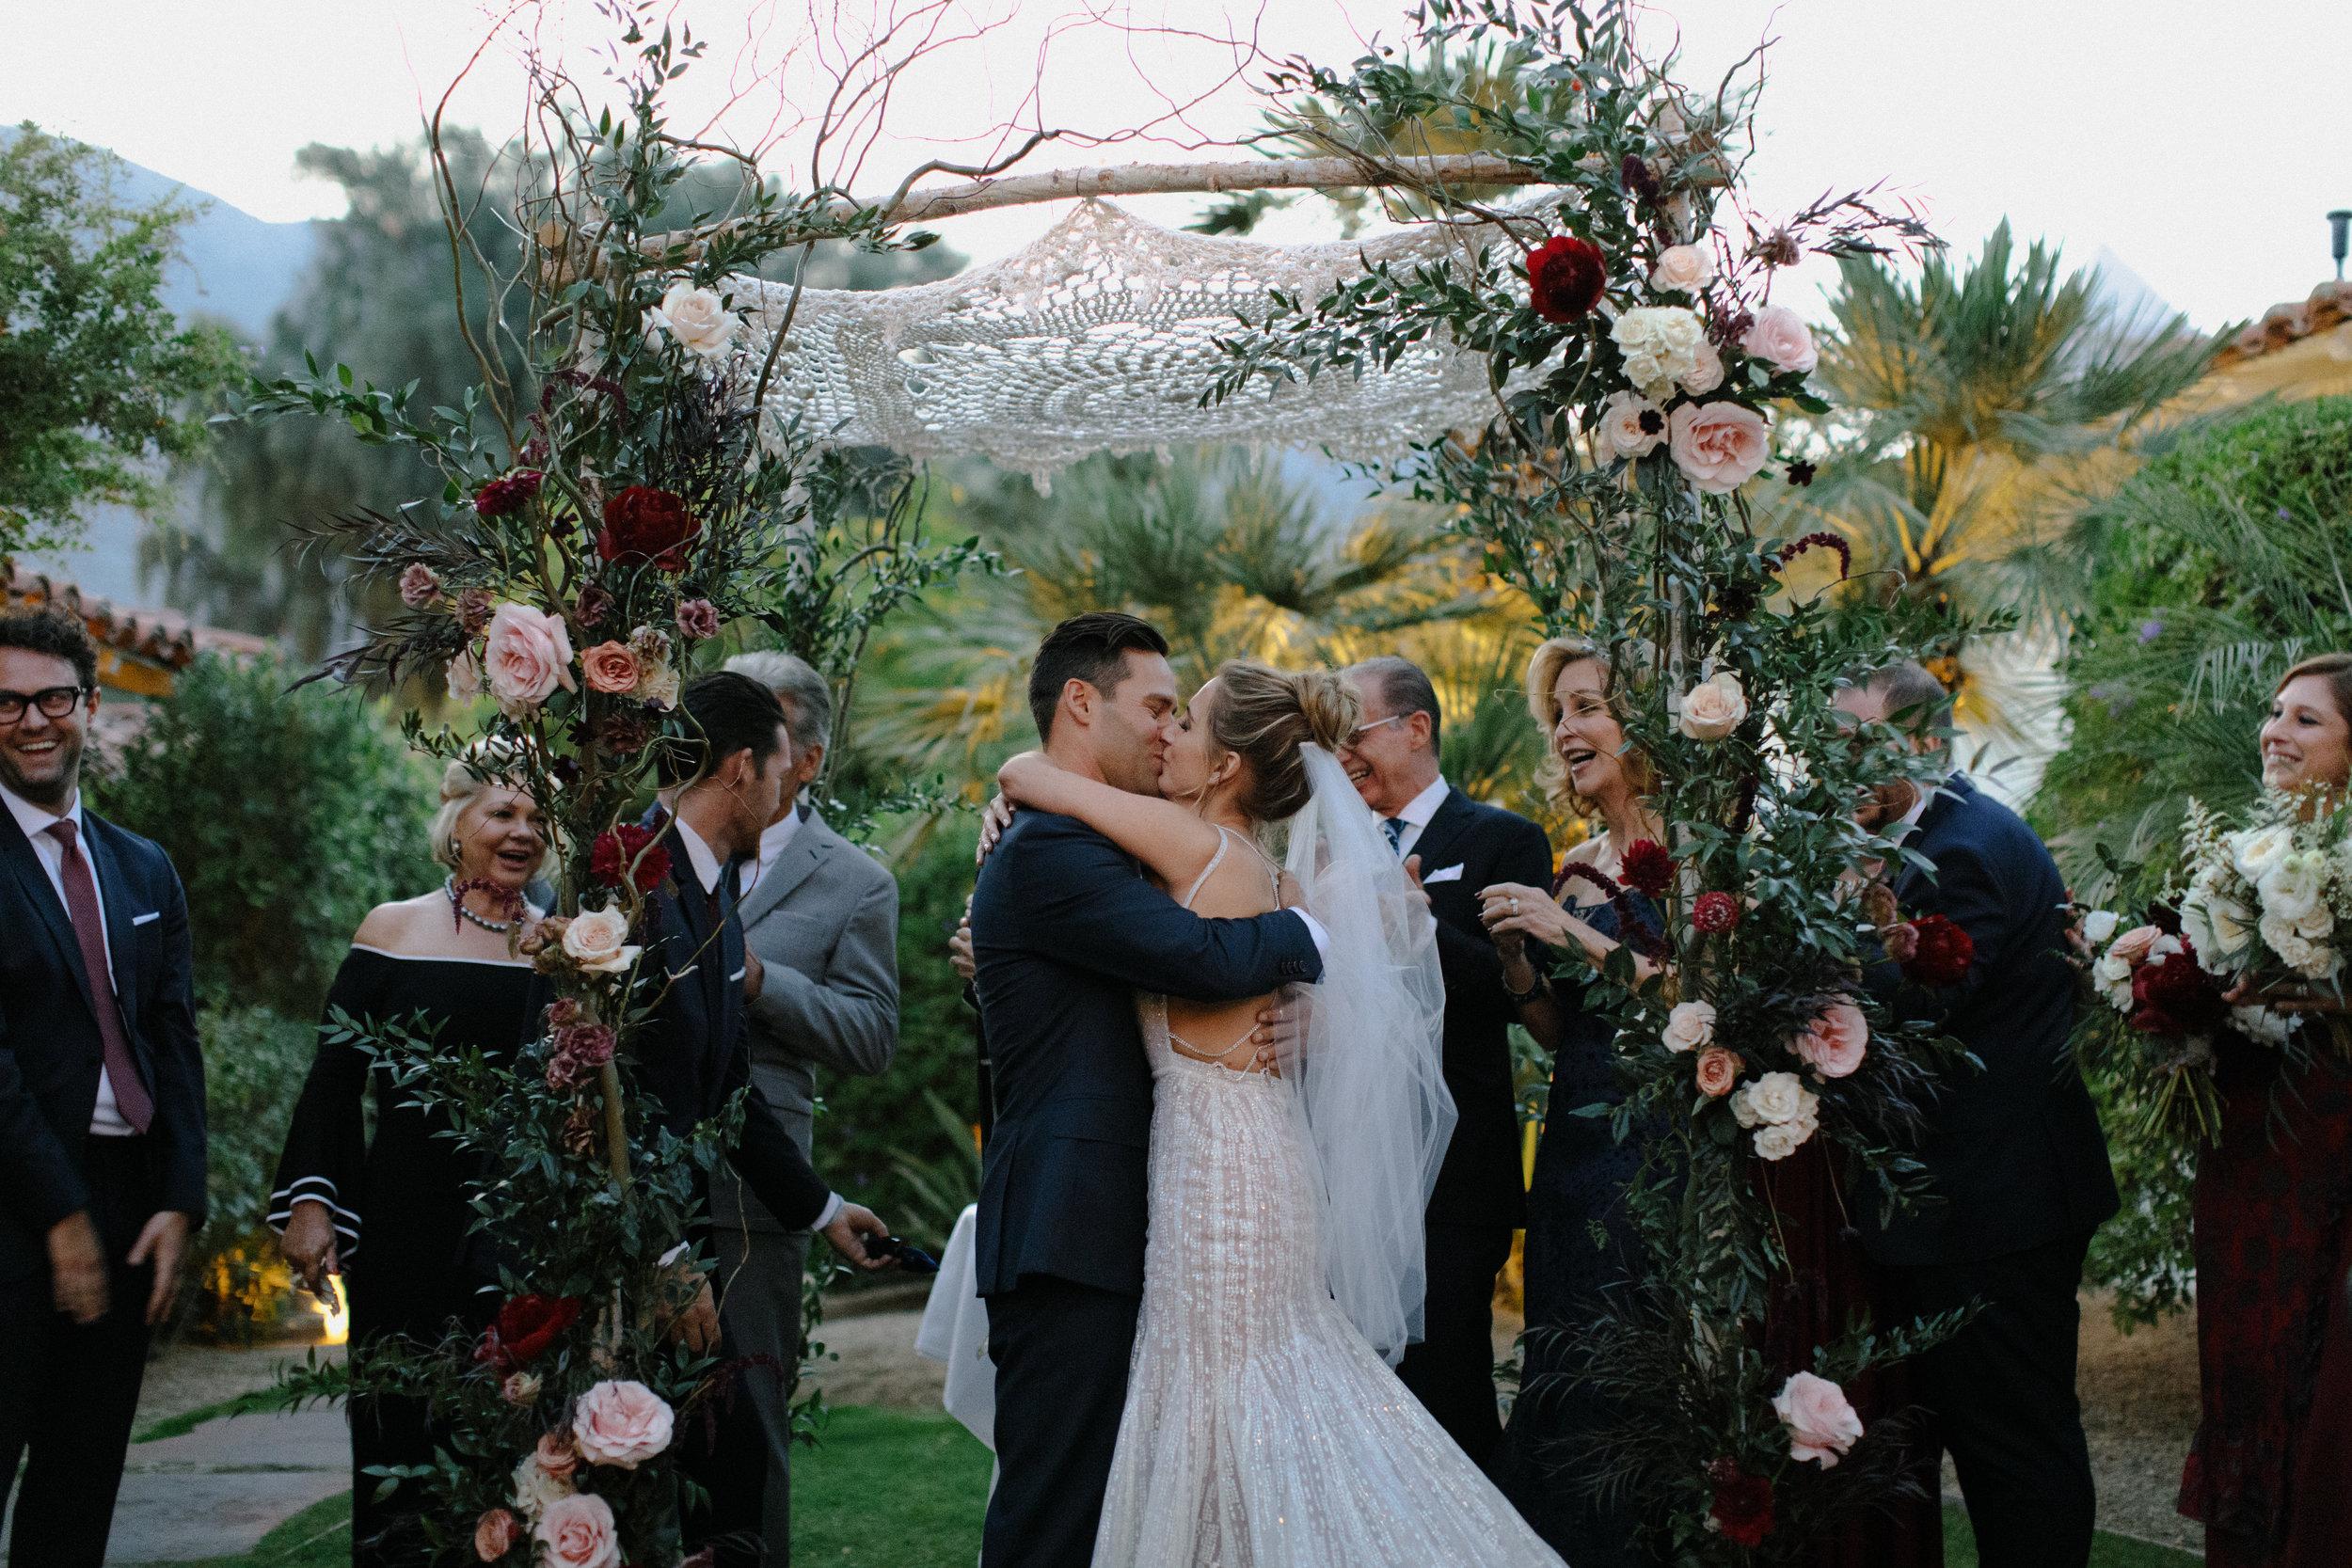 Dara_&_Garrett_Colony_Palms_Hotel_Wedding_Photos-417.jpg